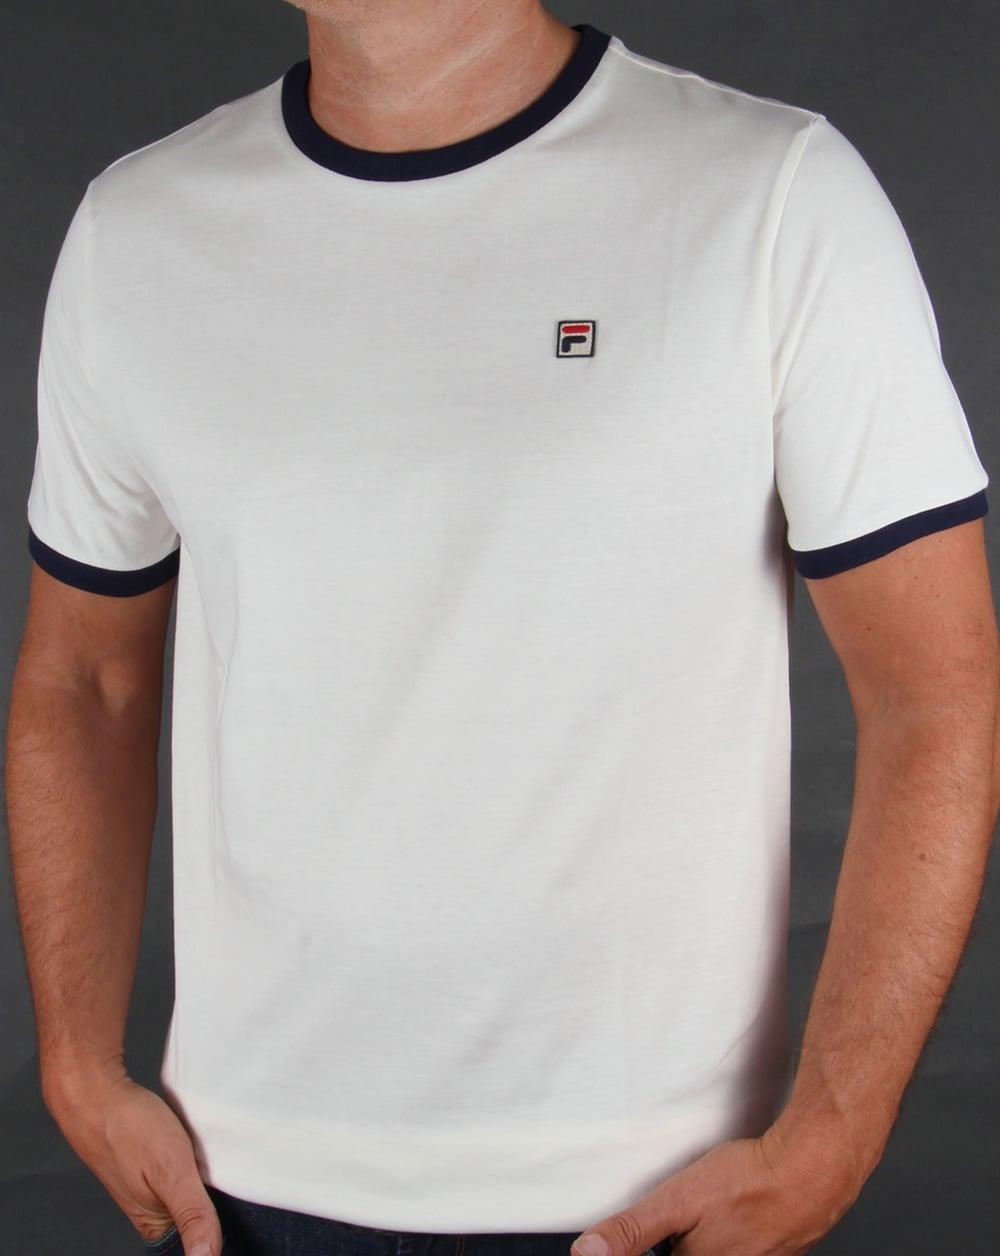 2bdc6115 Fila Vintage Ringer T-shirt Gardenia,marconi,tee,mens